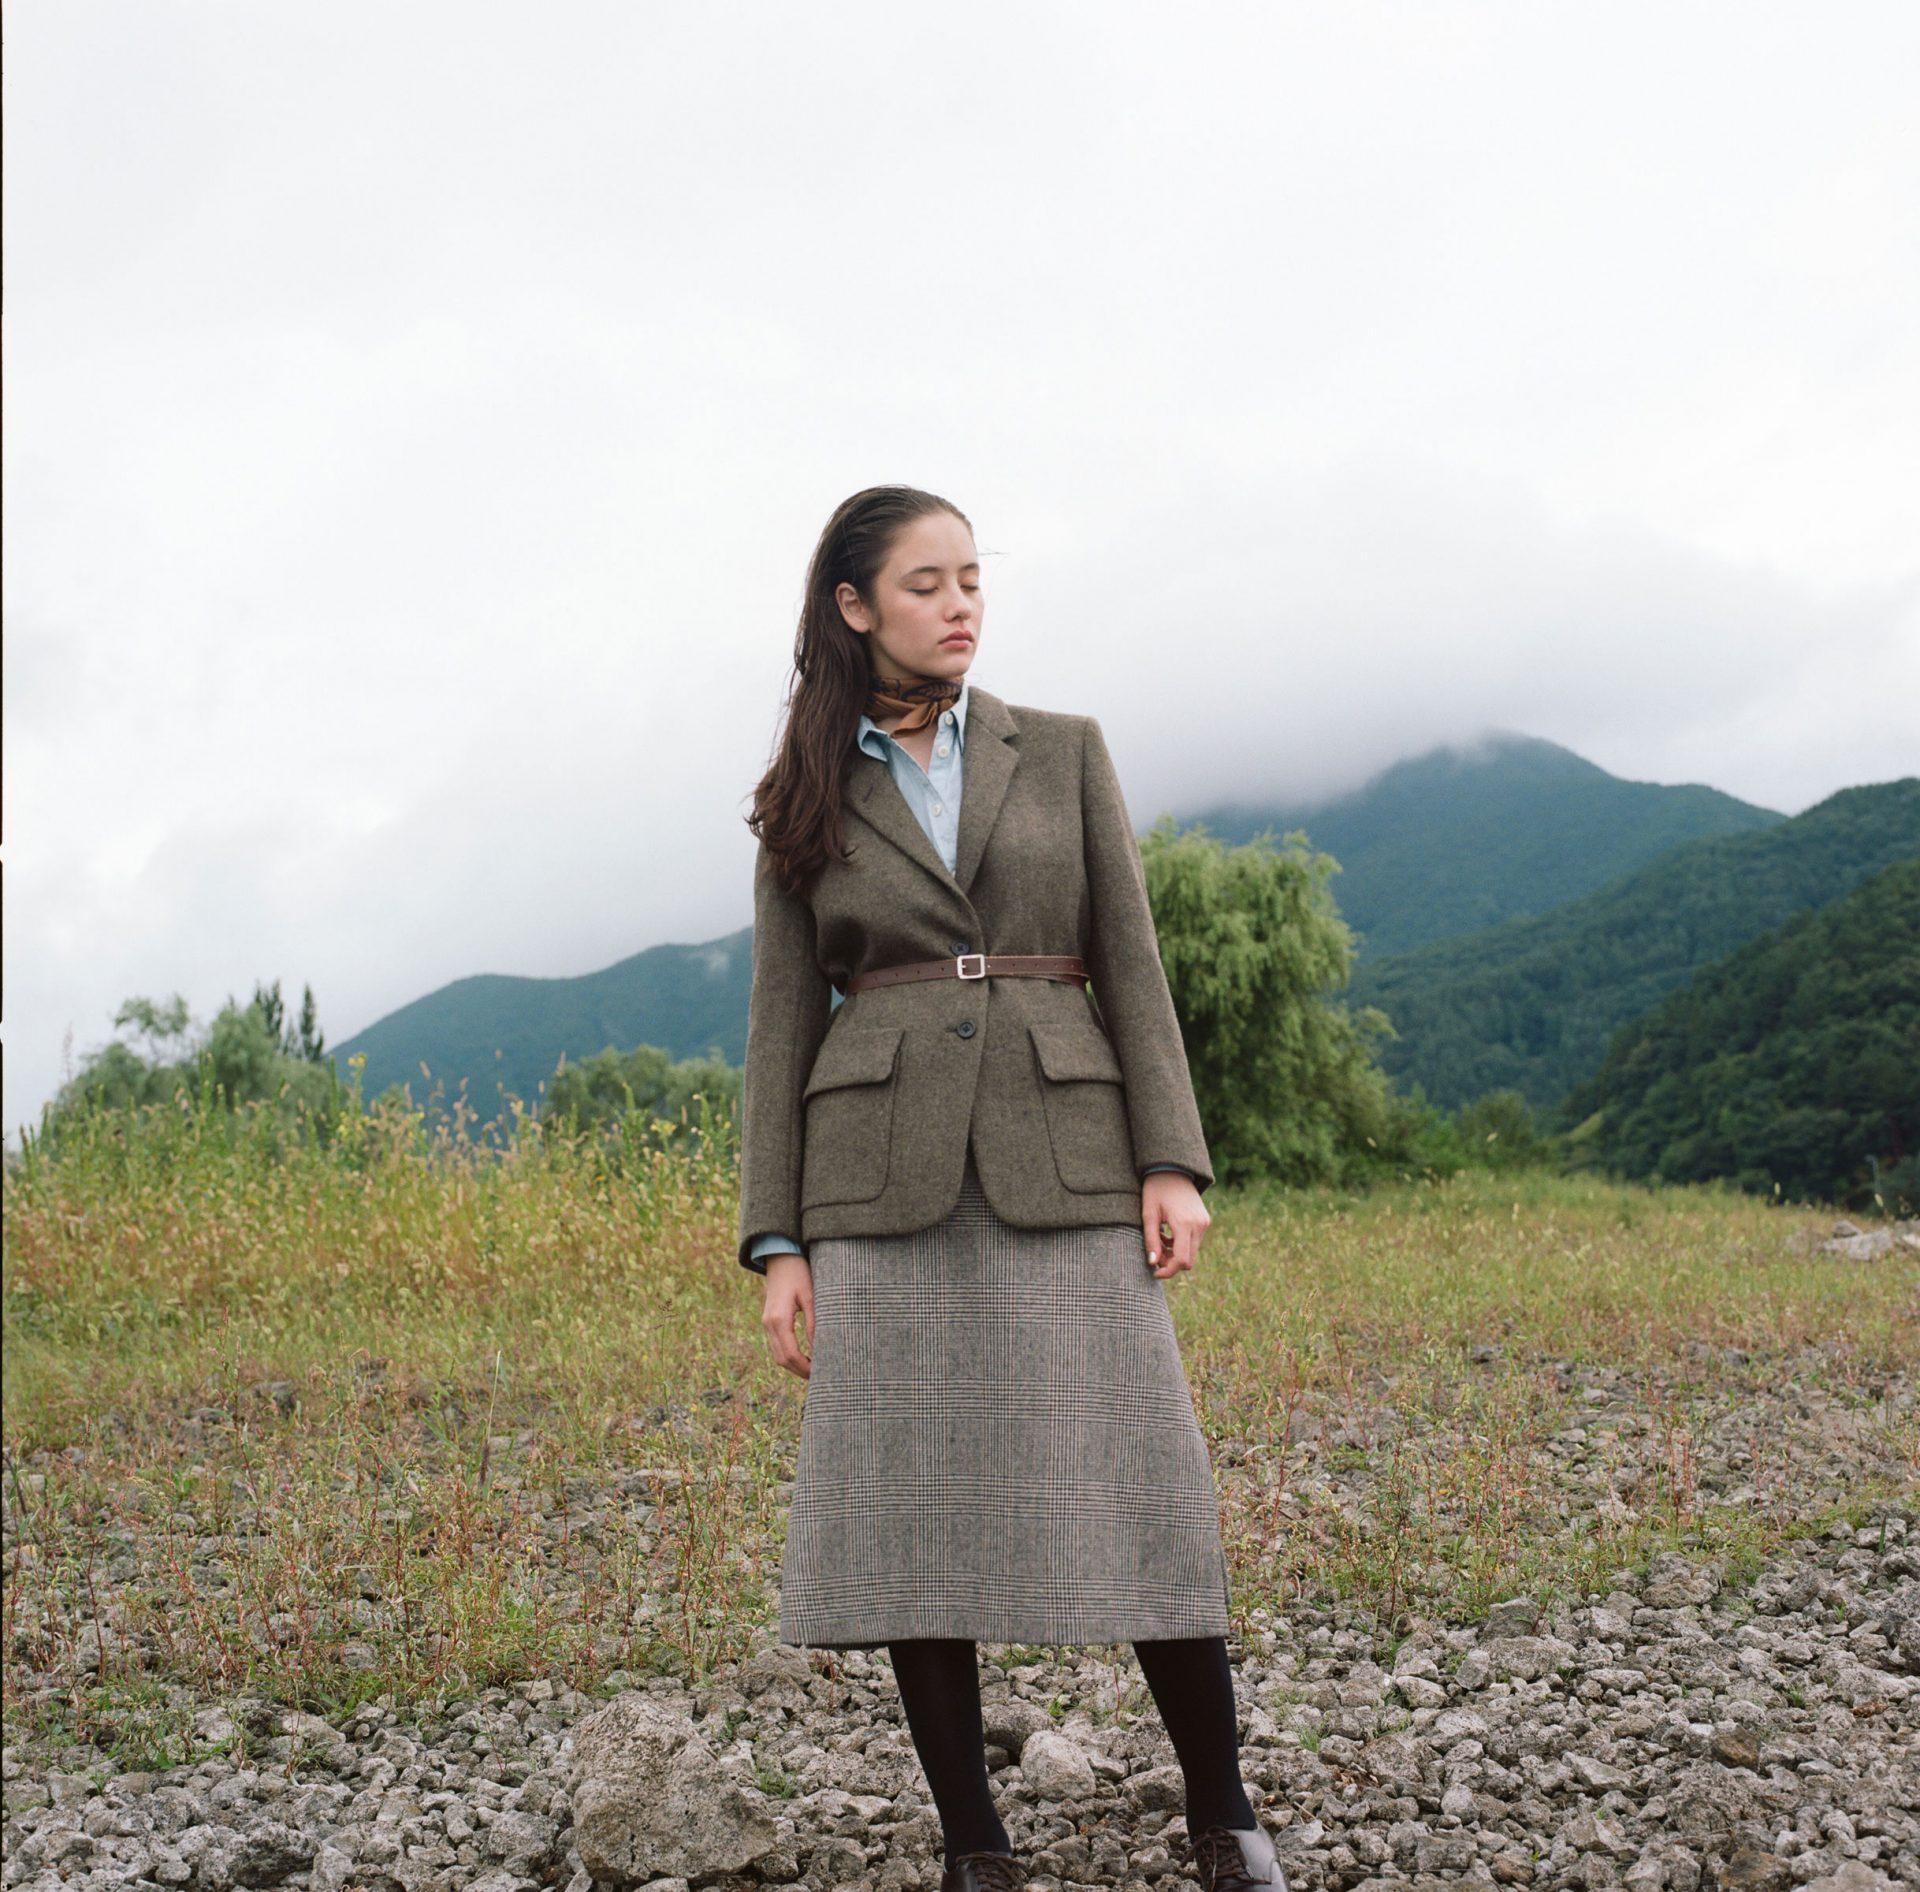 嶌原佑矢 YUYA SHIMAHARA CYAN 琉花